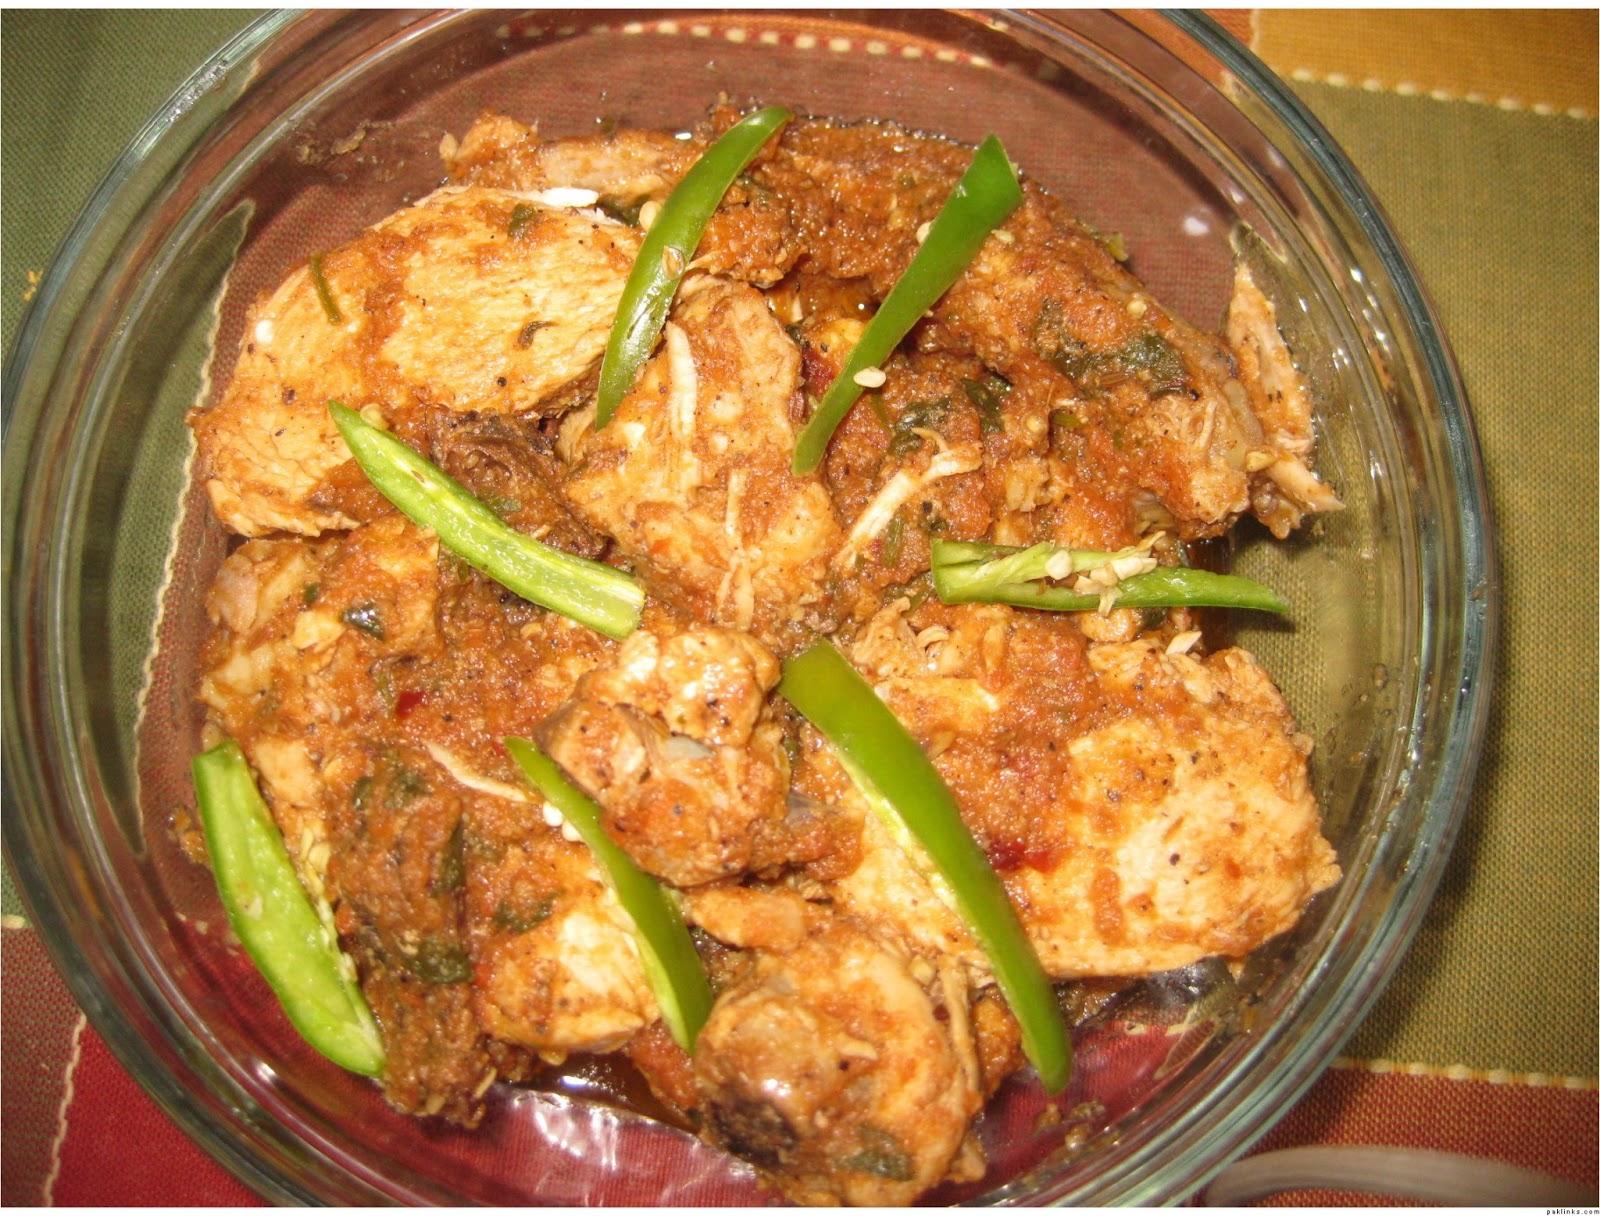 Pakistani Kitchen: Lahori Red Chicken Karahi